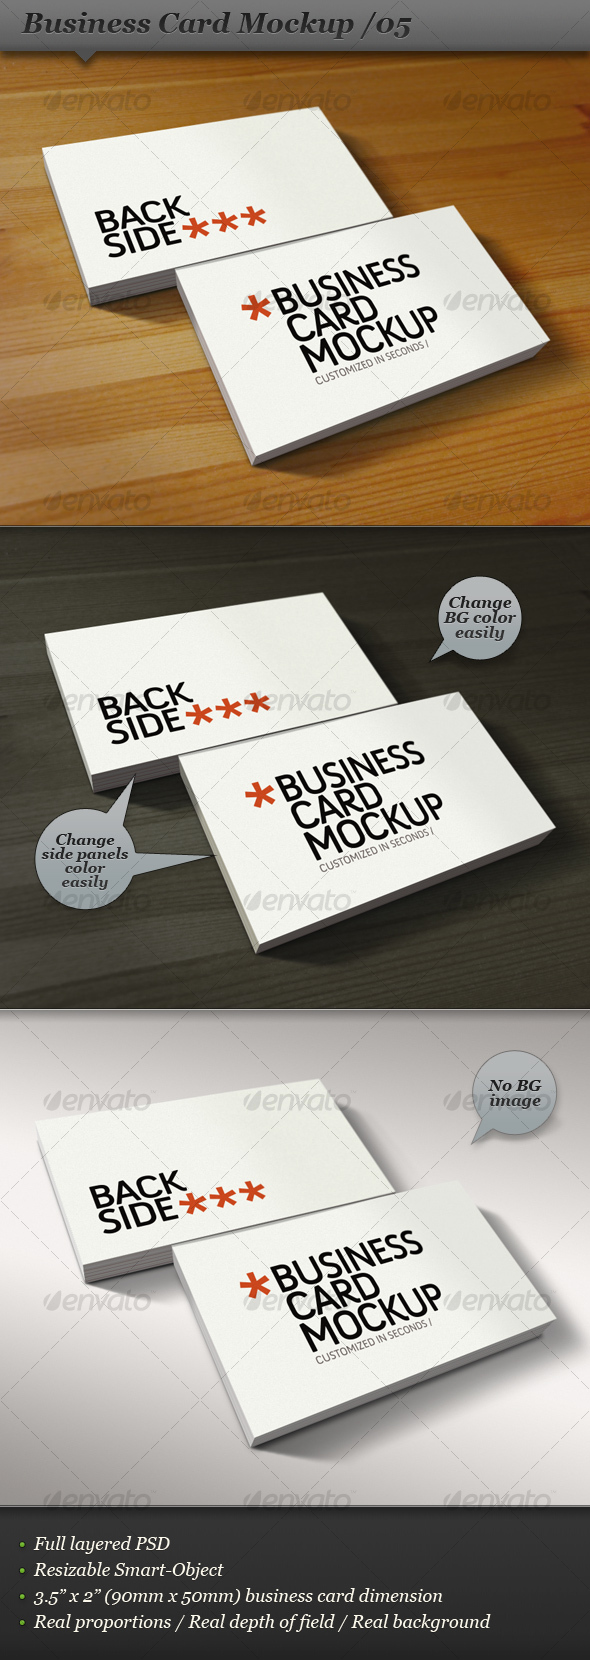 GraphicRiver Business card mockup display Smart template 05 108516